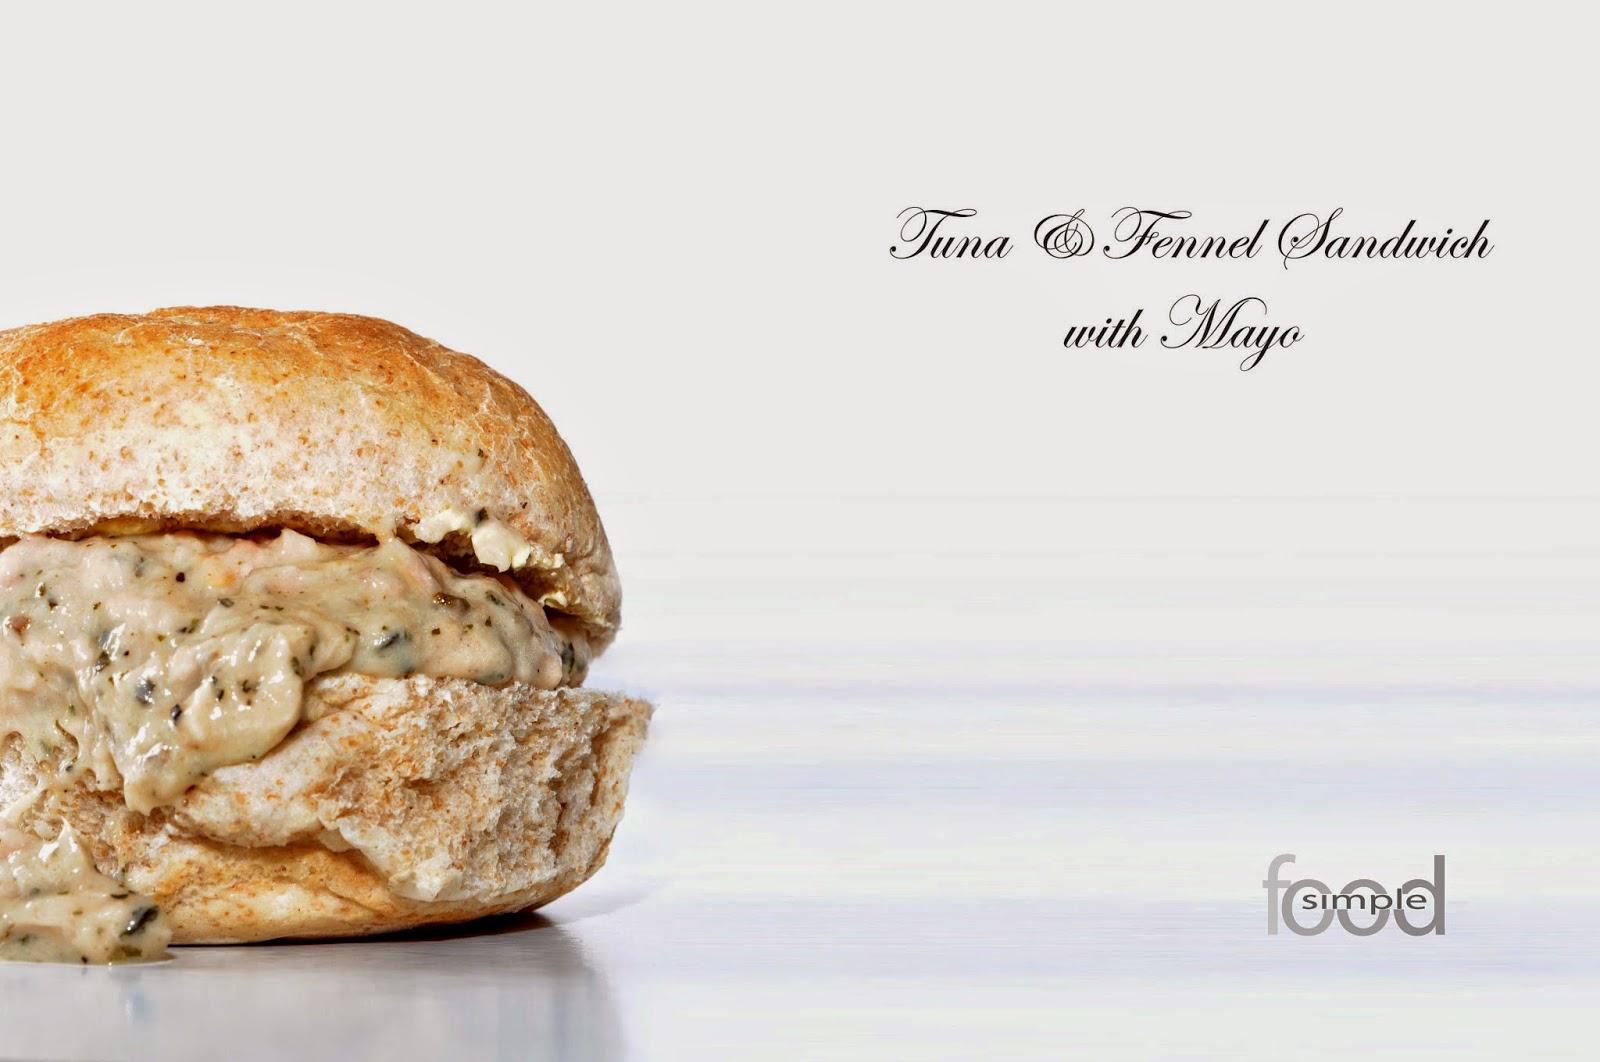 http://theartisttonyrose.blogspot.co.uk/2013/10/how-to-make-garlic-mayonnaise.html